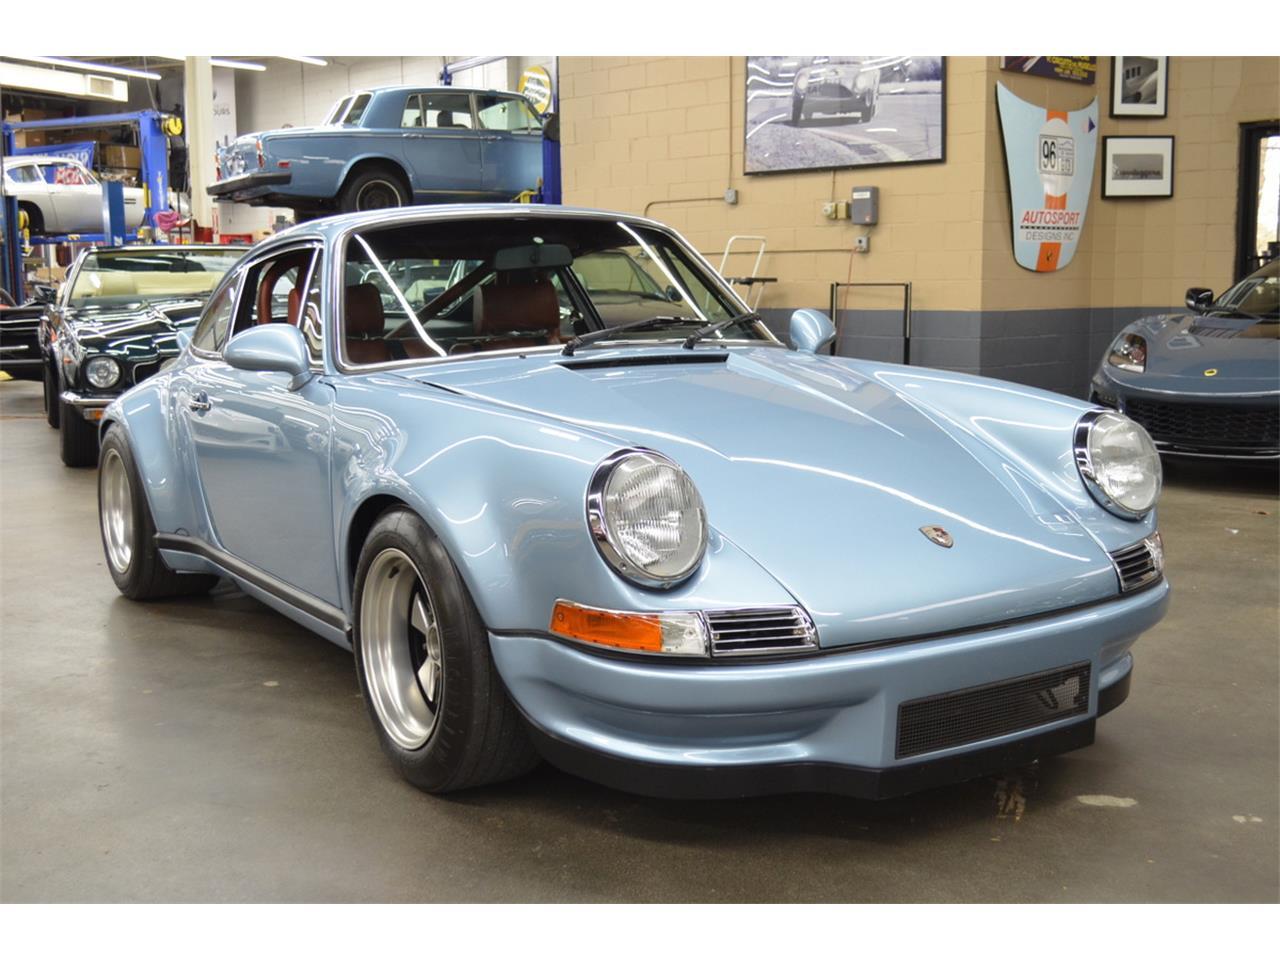 1980 Porsche 911 Turbo For Sale Classiccars Com Cc 1342714